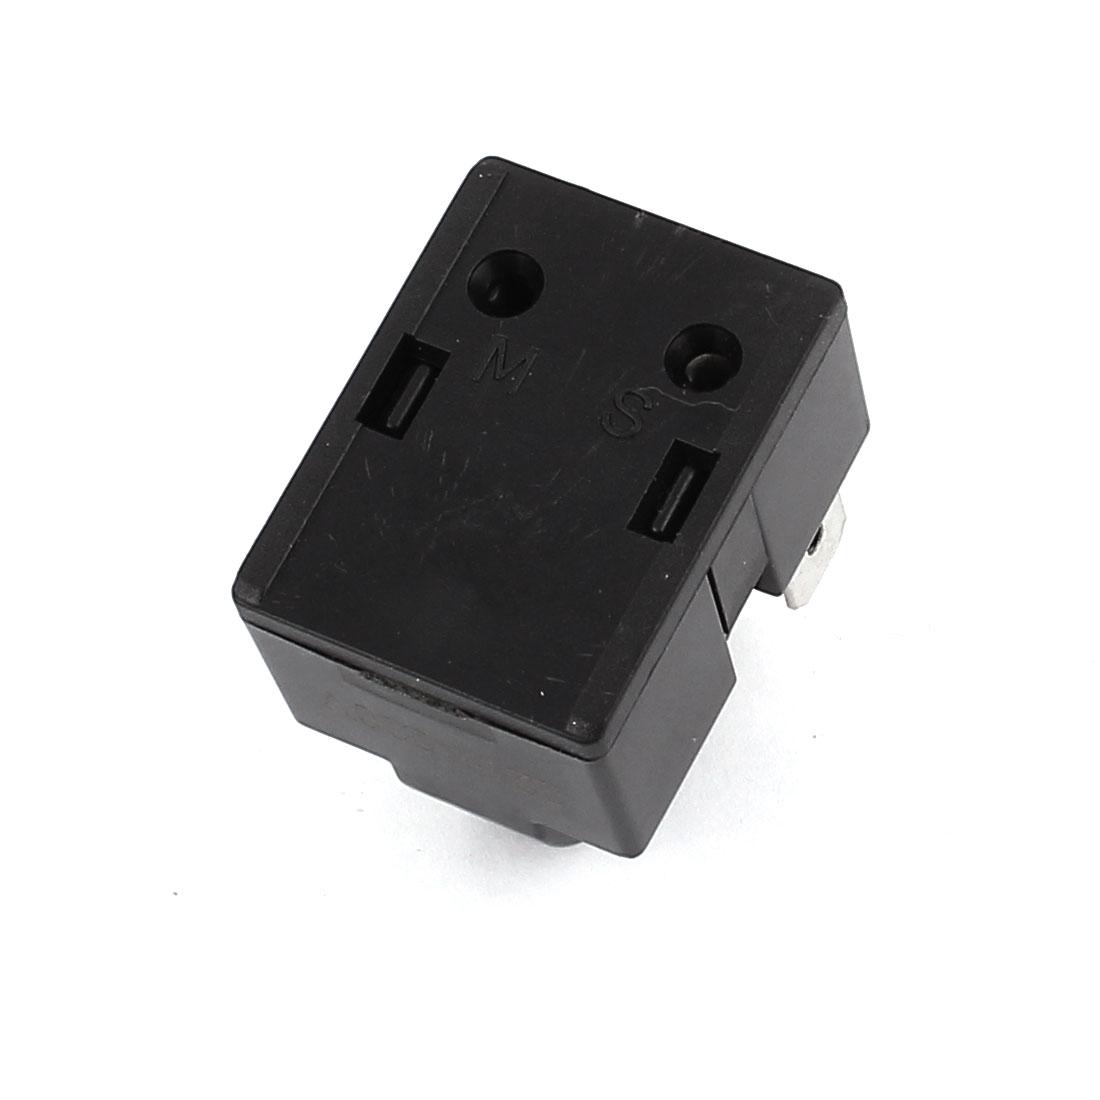 2Pcs 220V Plastic Shell 22 Ohm 2 Terminals Refrigerator PTC Starter Relay Black 2